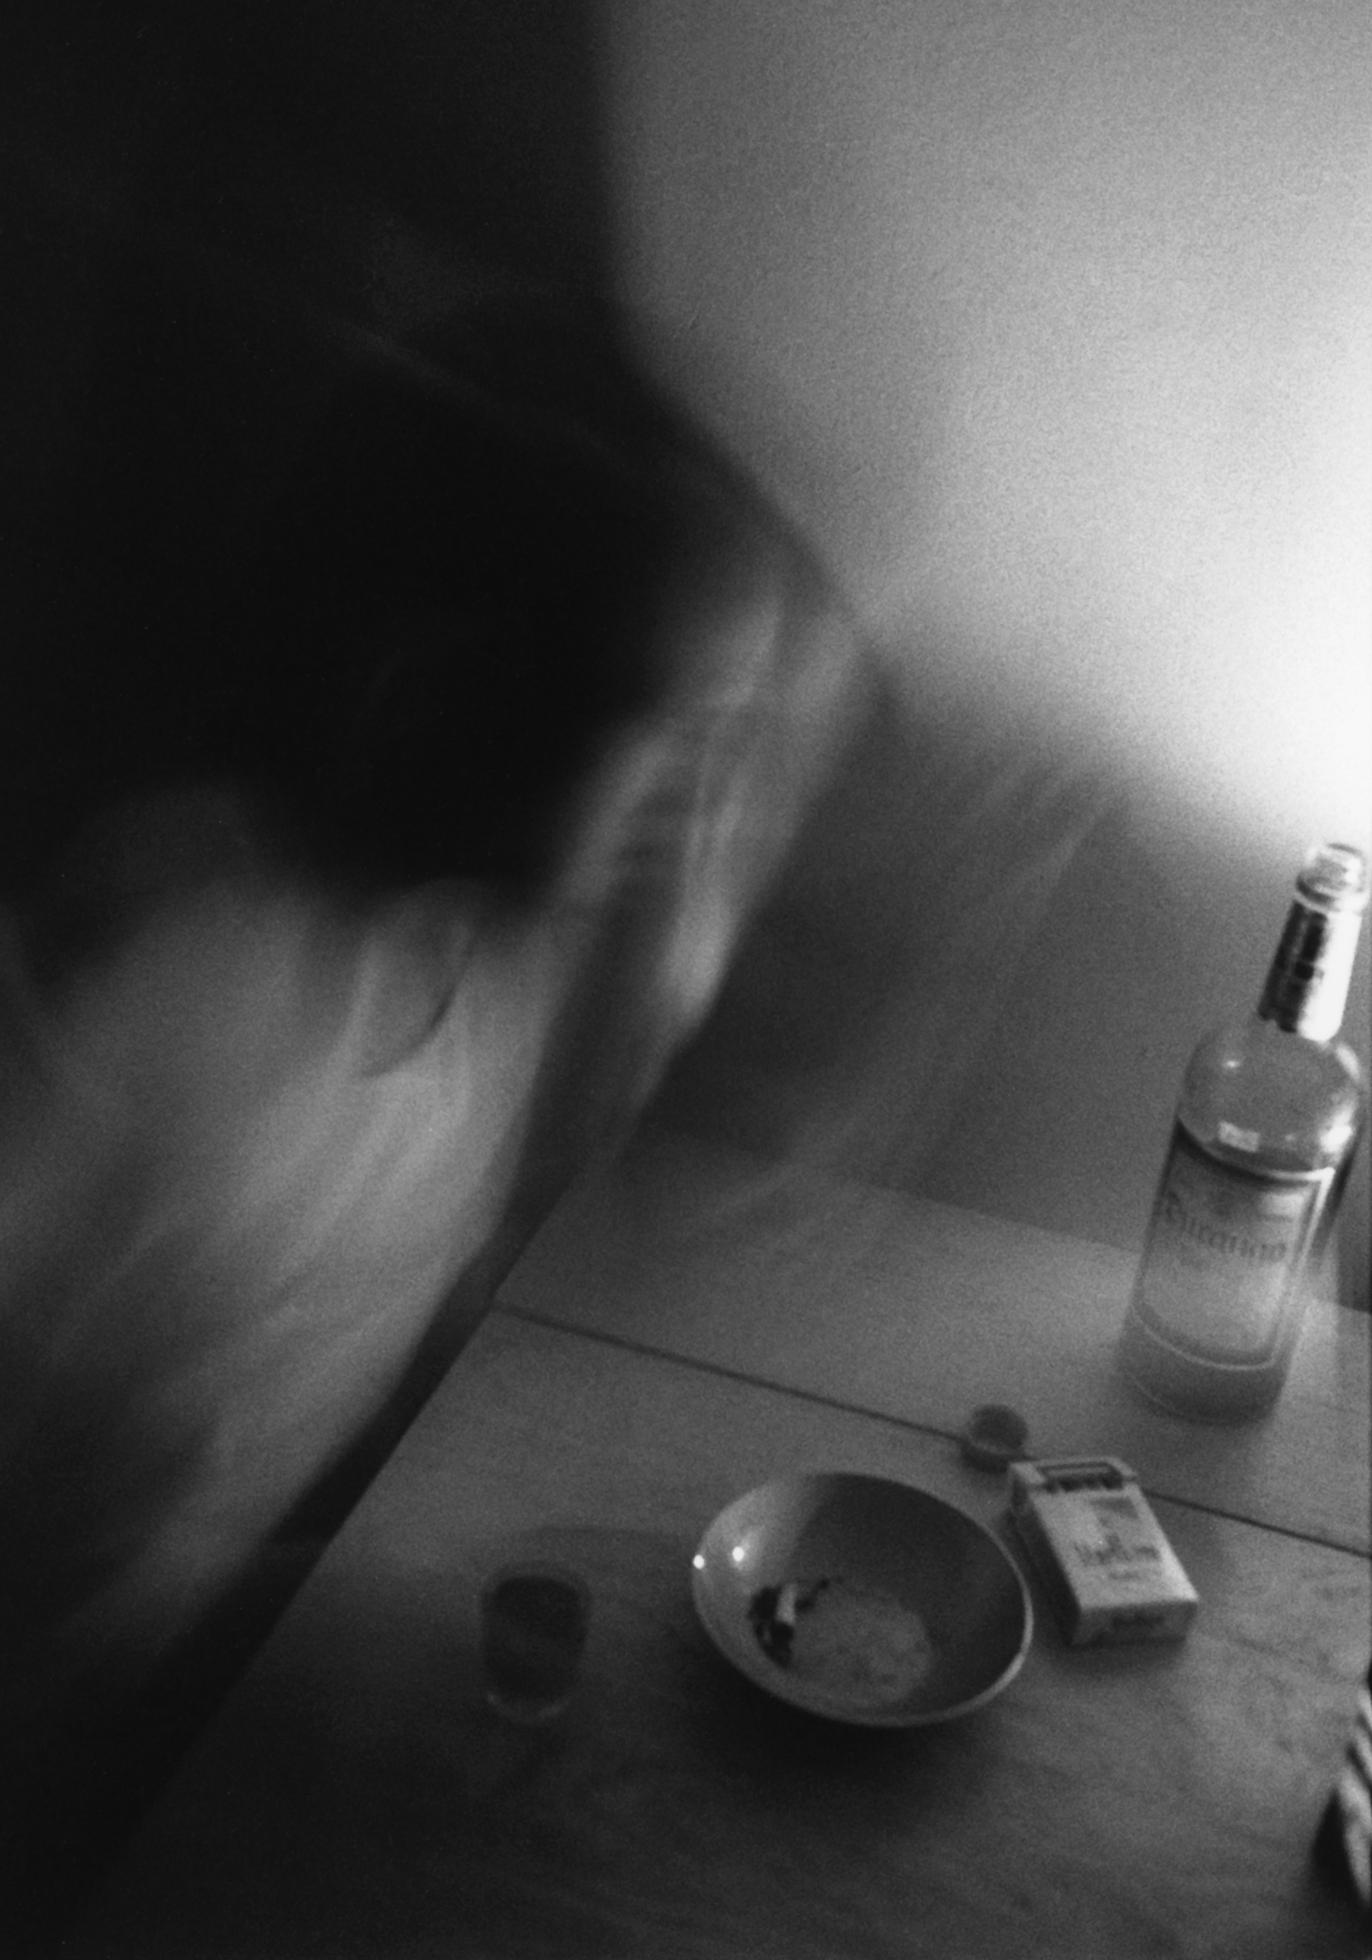 409 - Arpante - Narrow Escapes